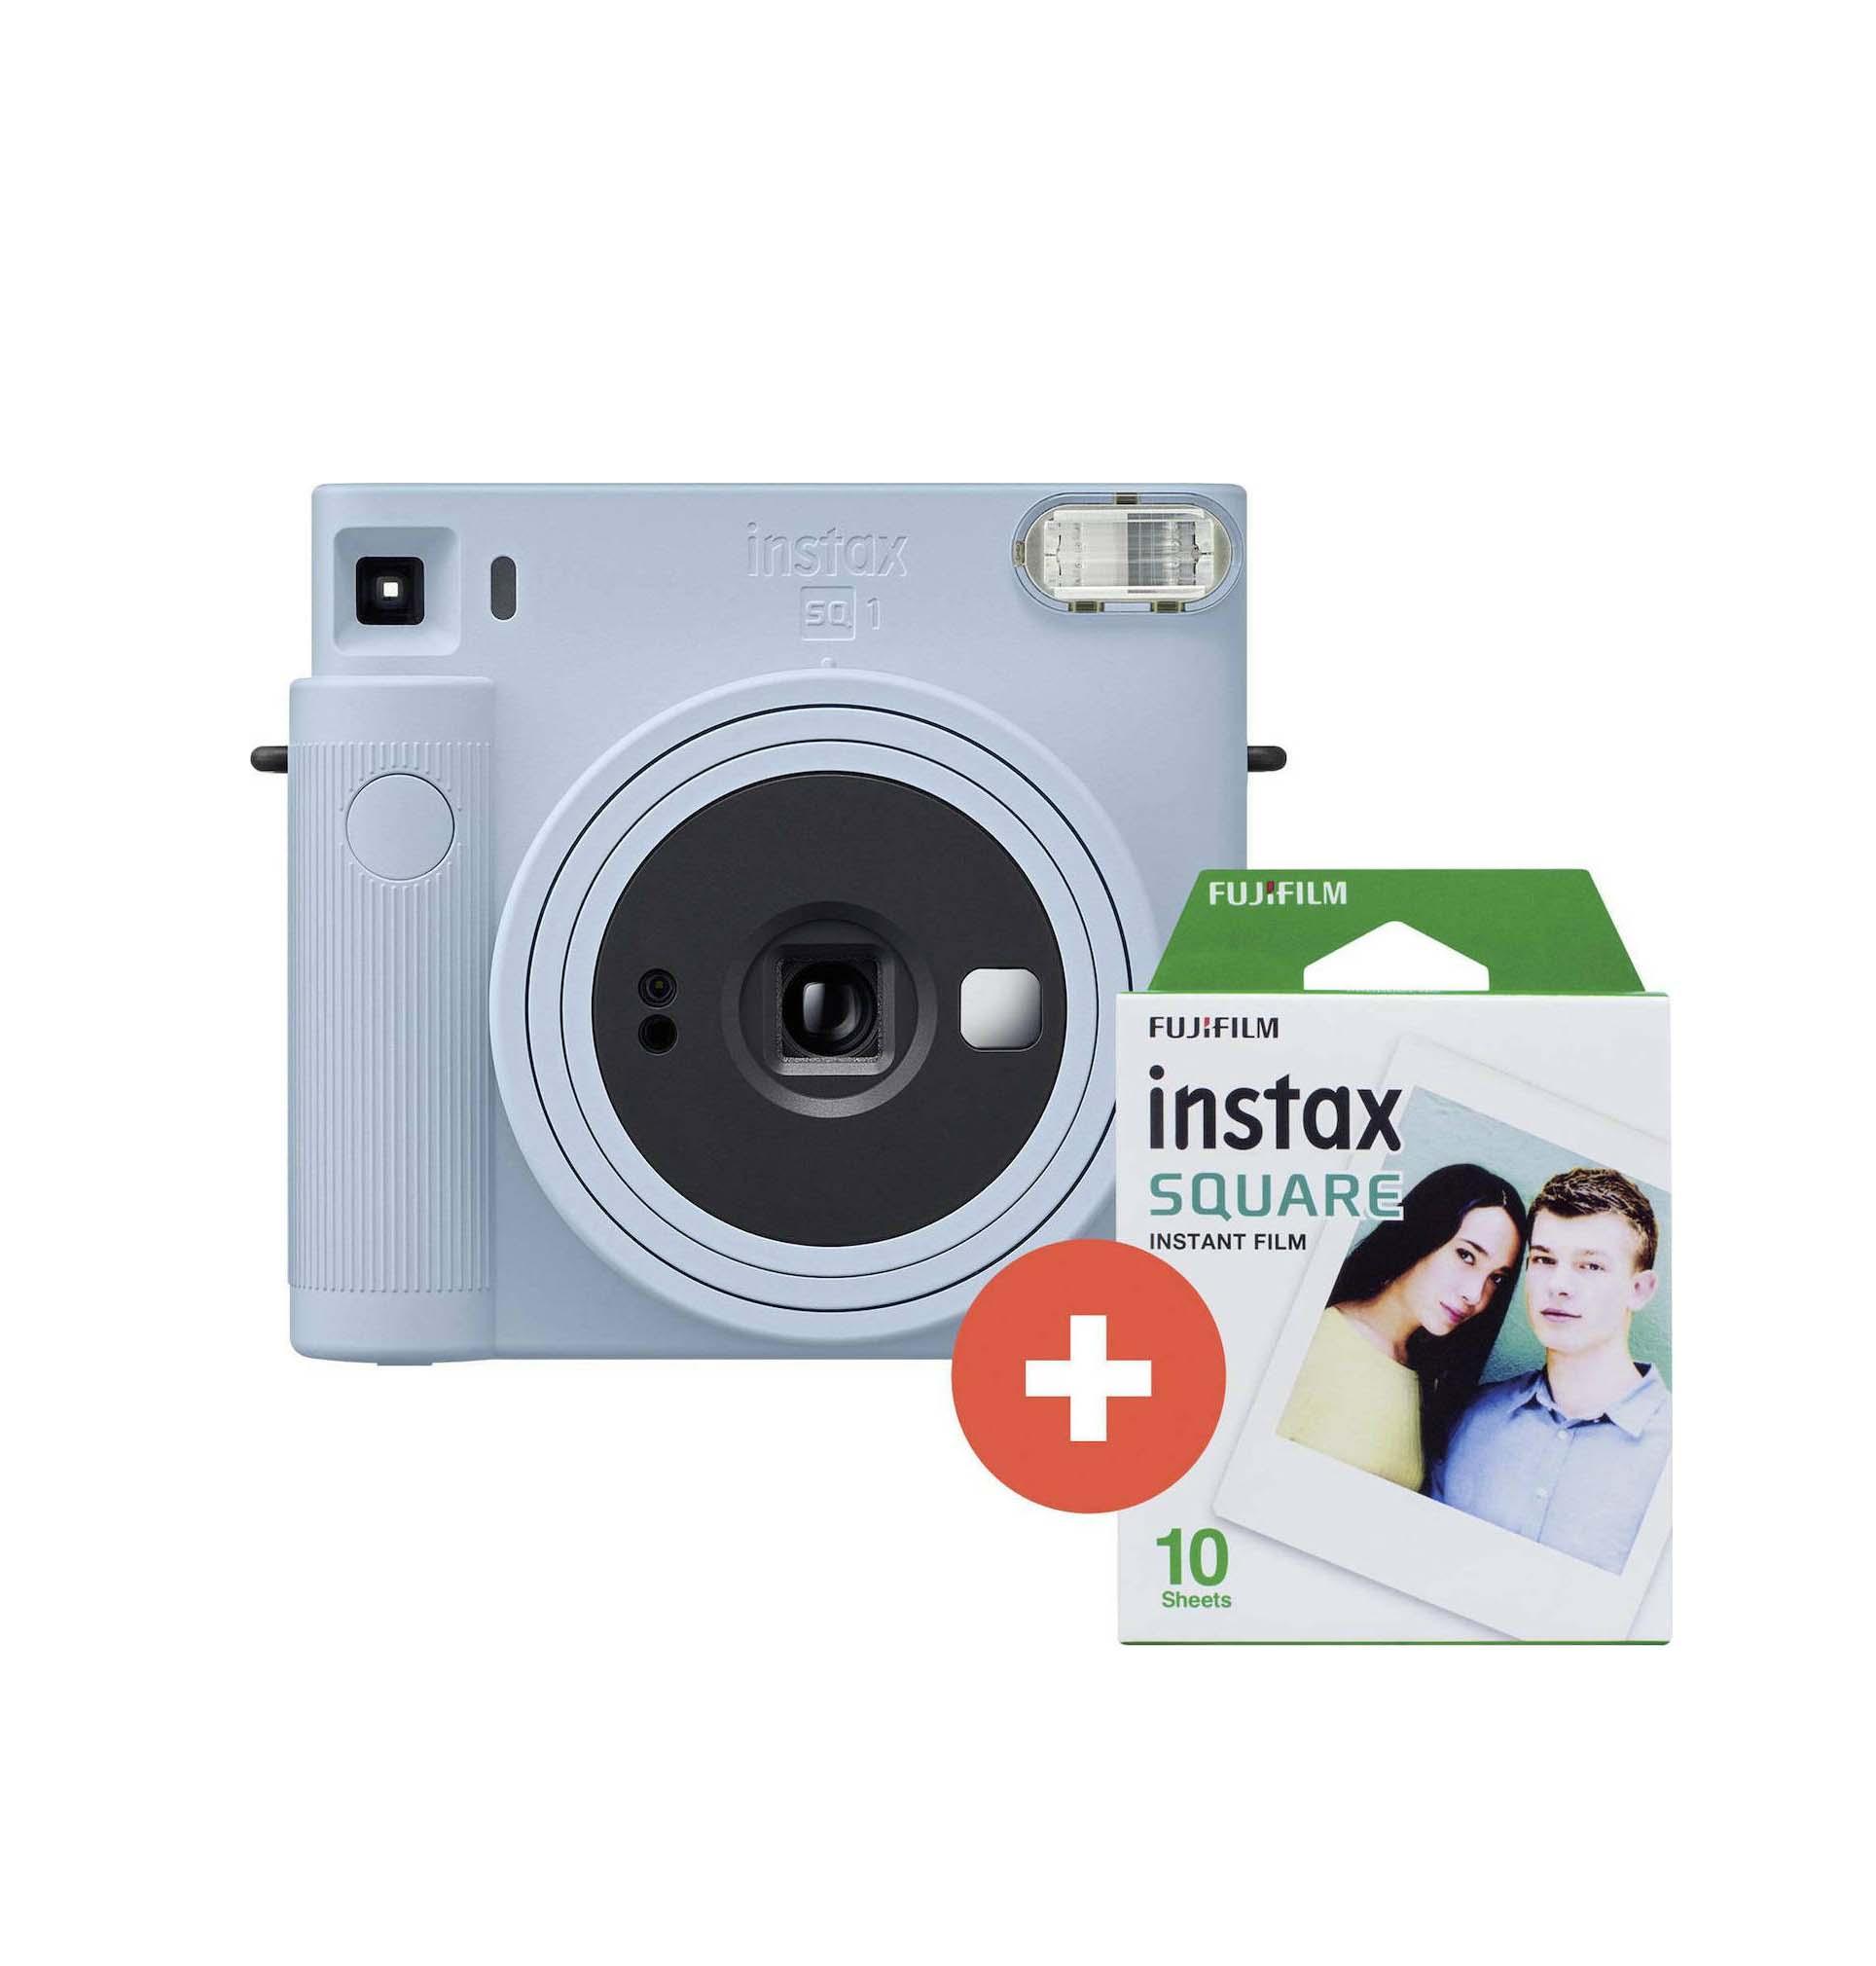 Fujifilm Instax Square SQ 1 Set Glacier Blue Αναλογική Φωτογραφική Μηχανή 70100148678